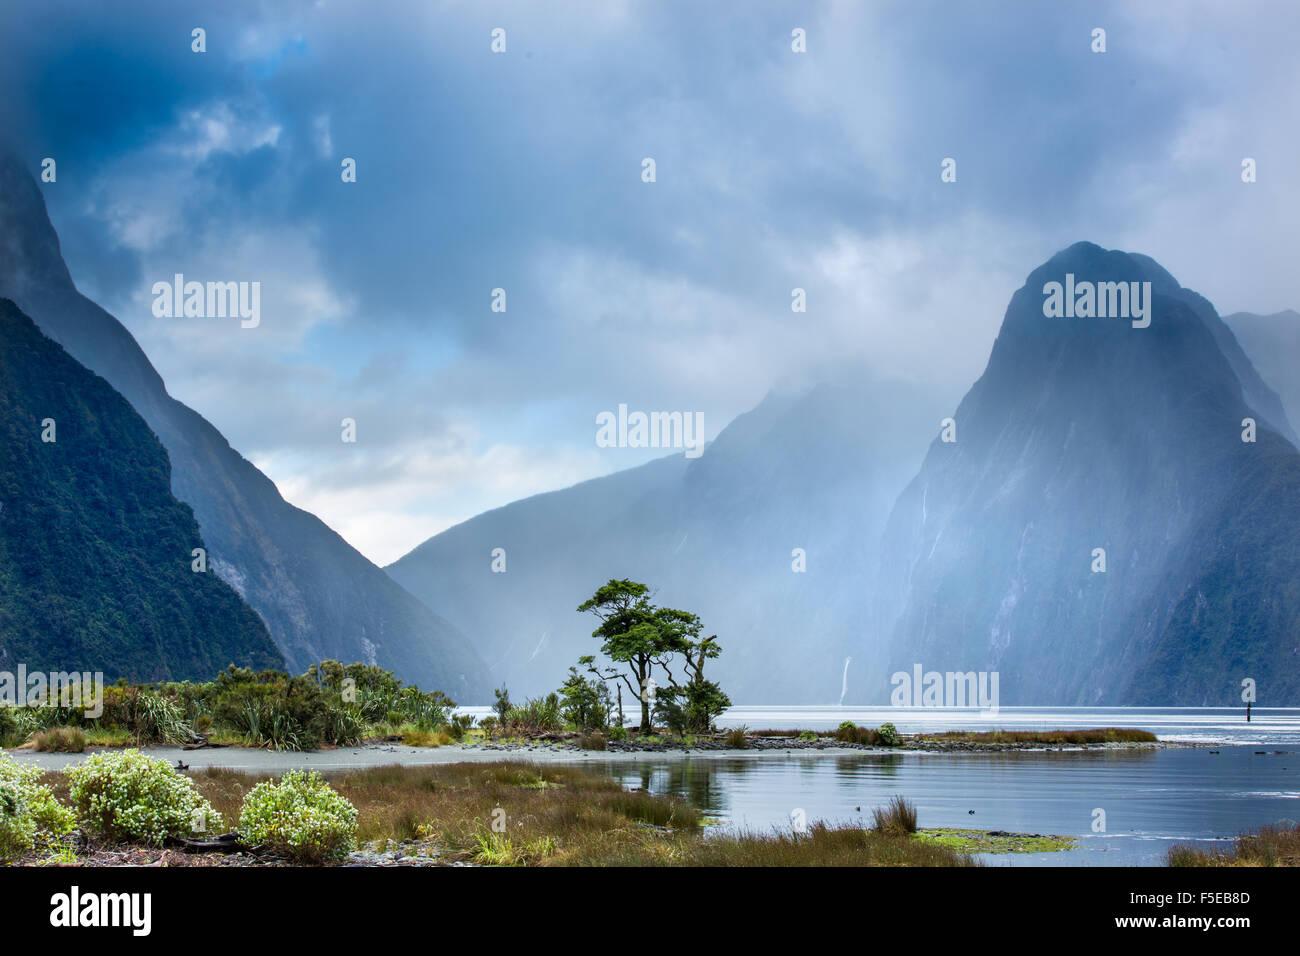 Milford Sound, Fiordland National Park, UNESCO World Heritage Site, Piopiotahi Marine Reserve, South Island, New - Stock Image